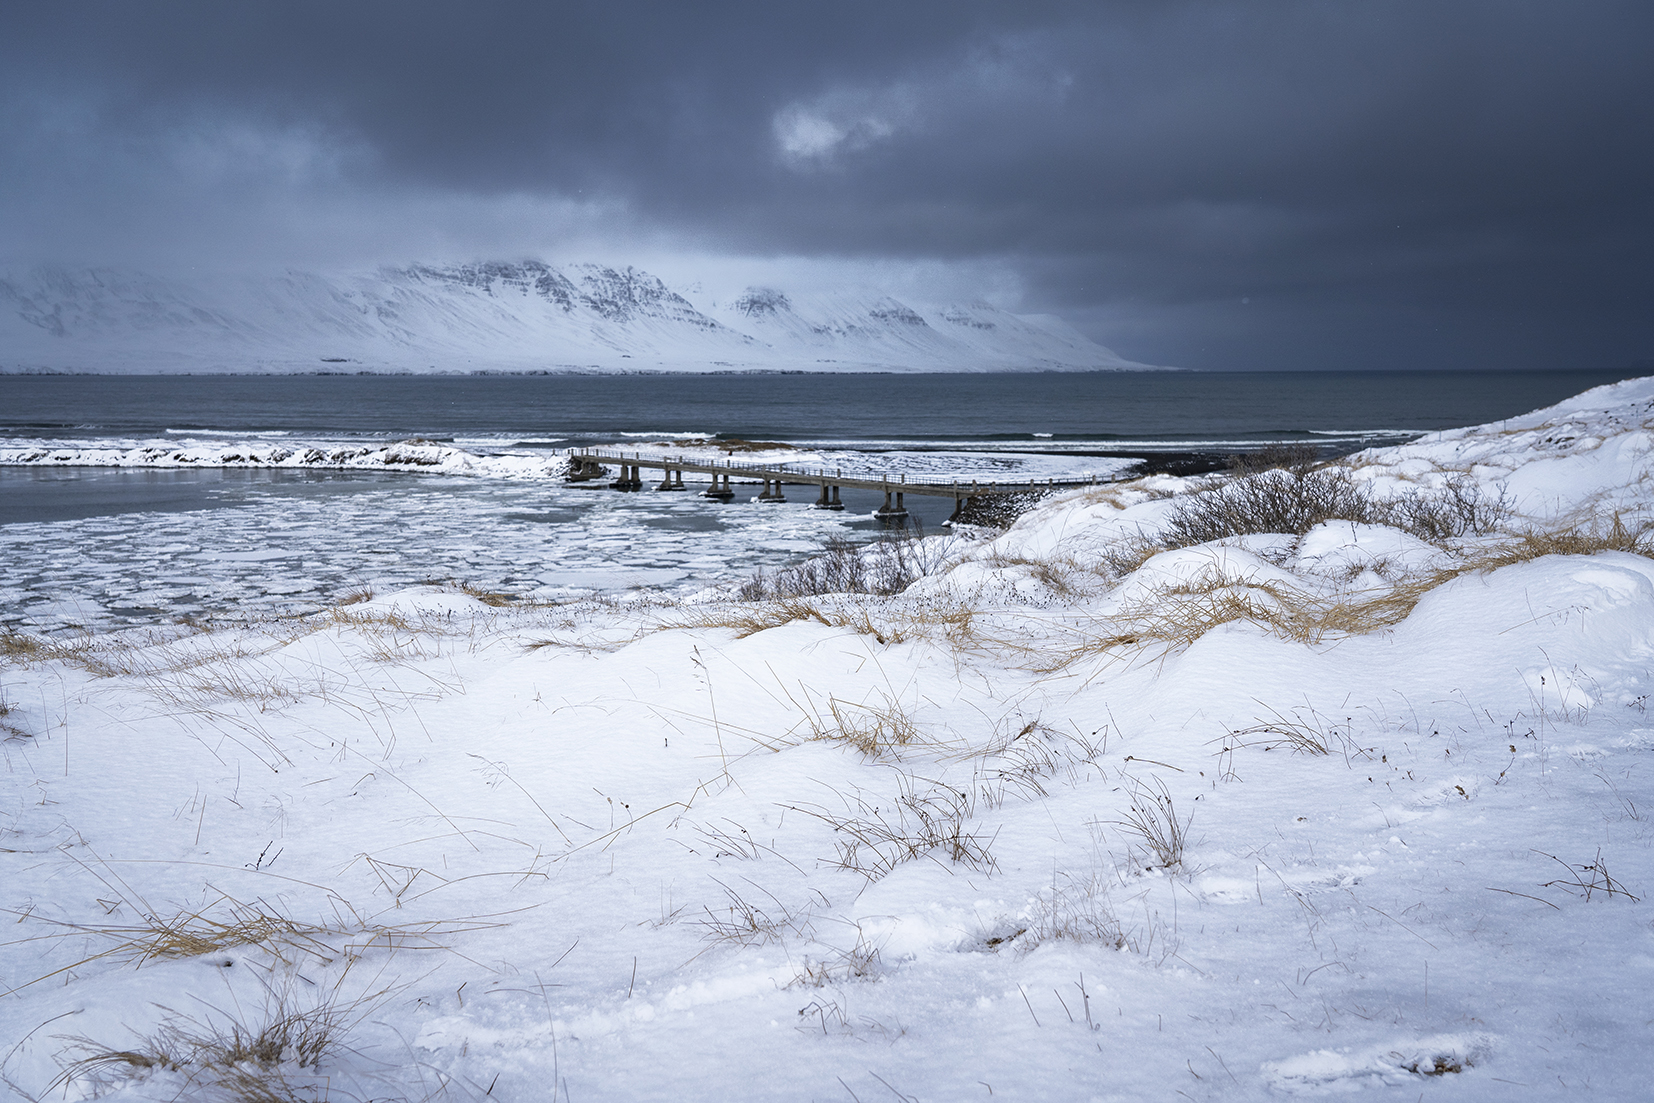 Skagafjördur Islande du Nord ponton montagnes mer neige nuages noirs